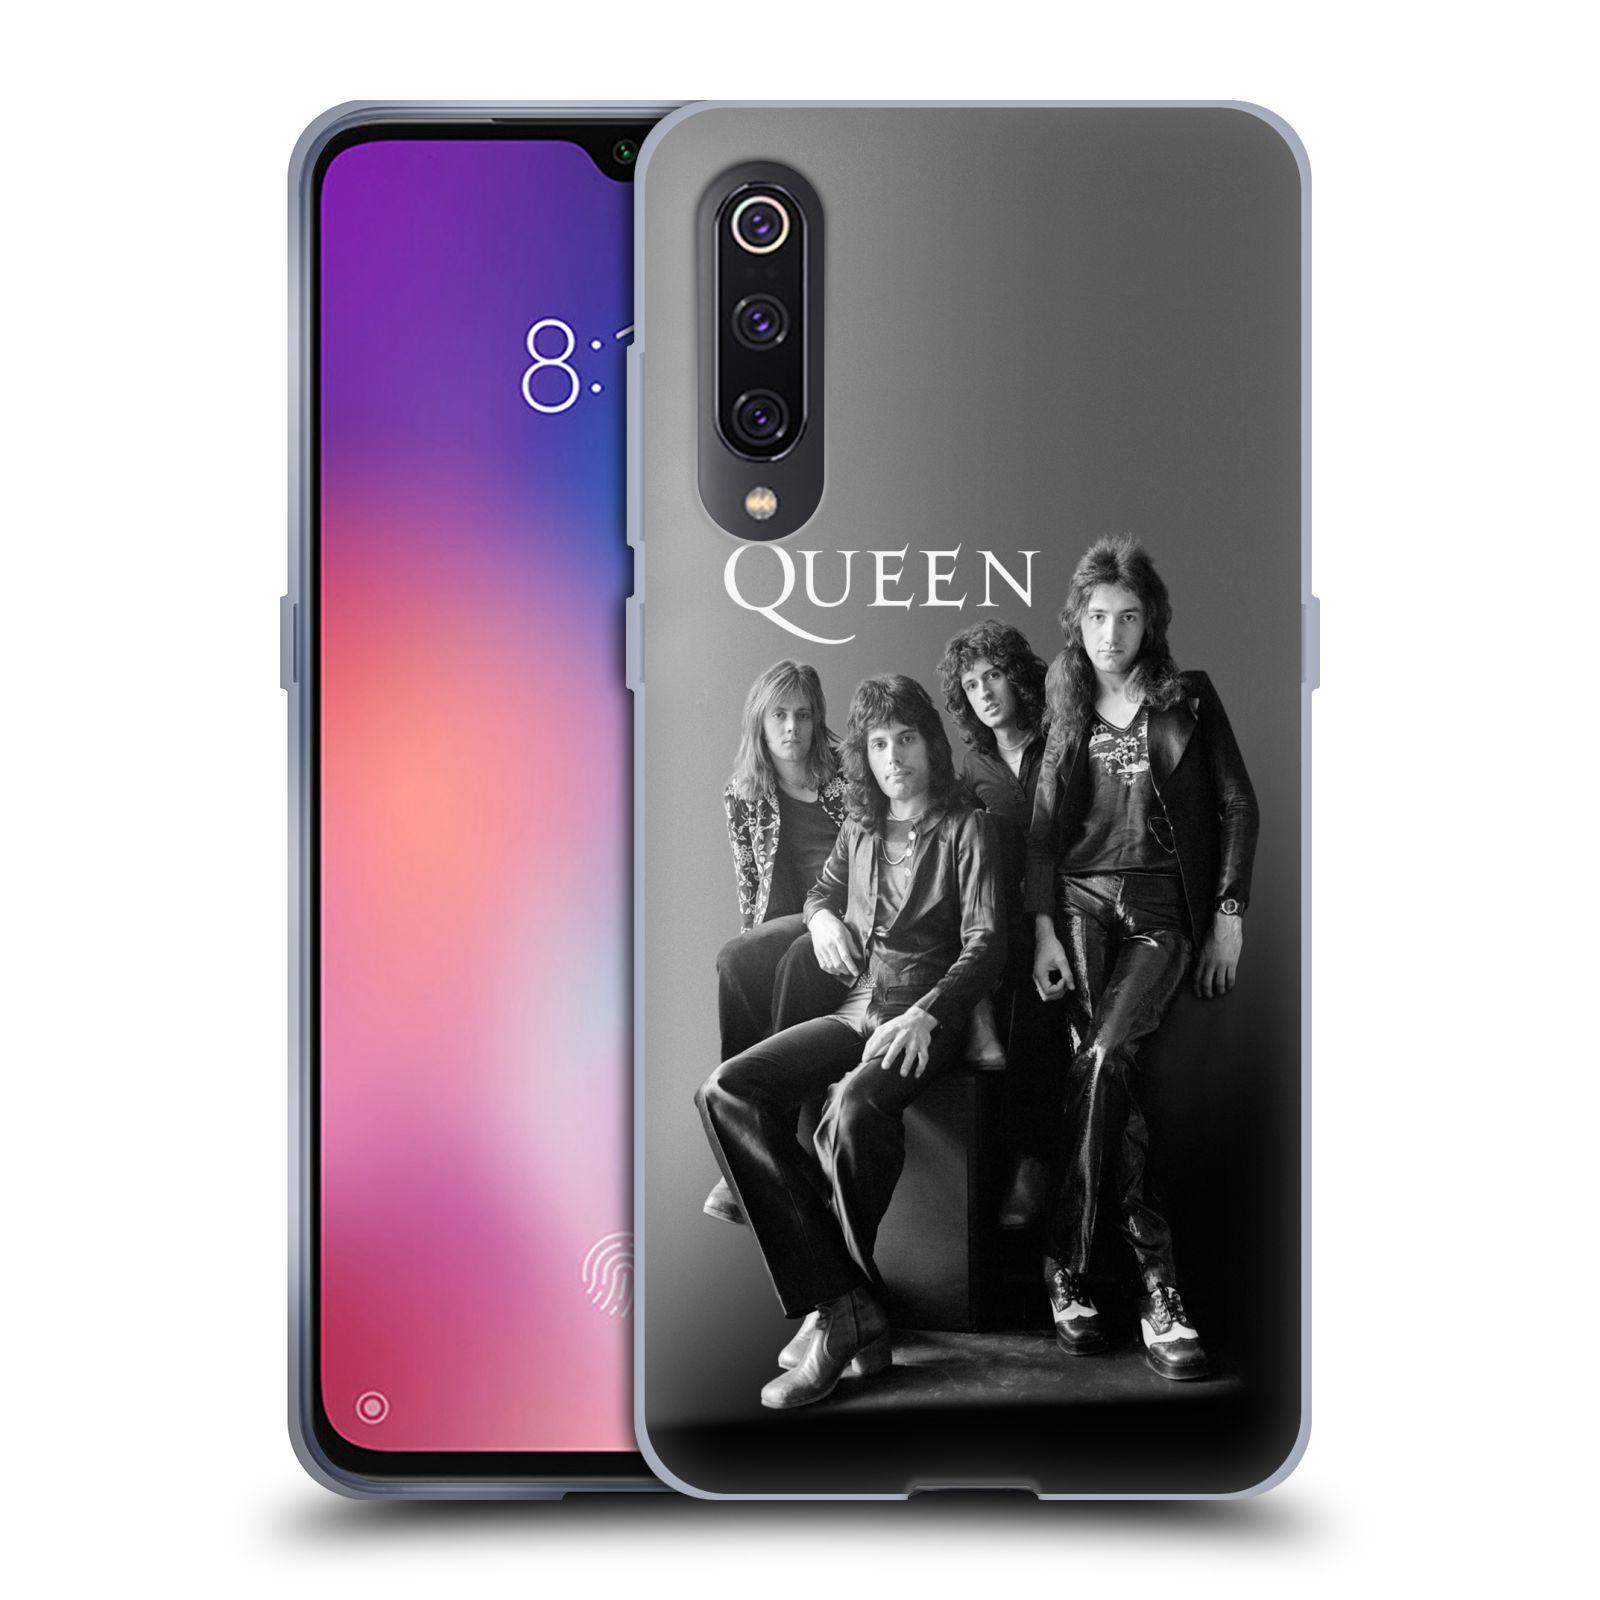 Silikonové pouzdro na mobil Xiaomi Mi 9 - Head Case - Queen - Skupina